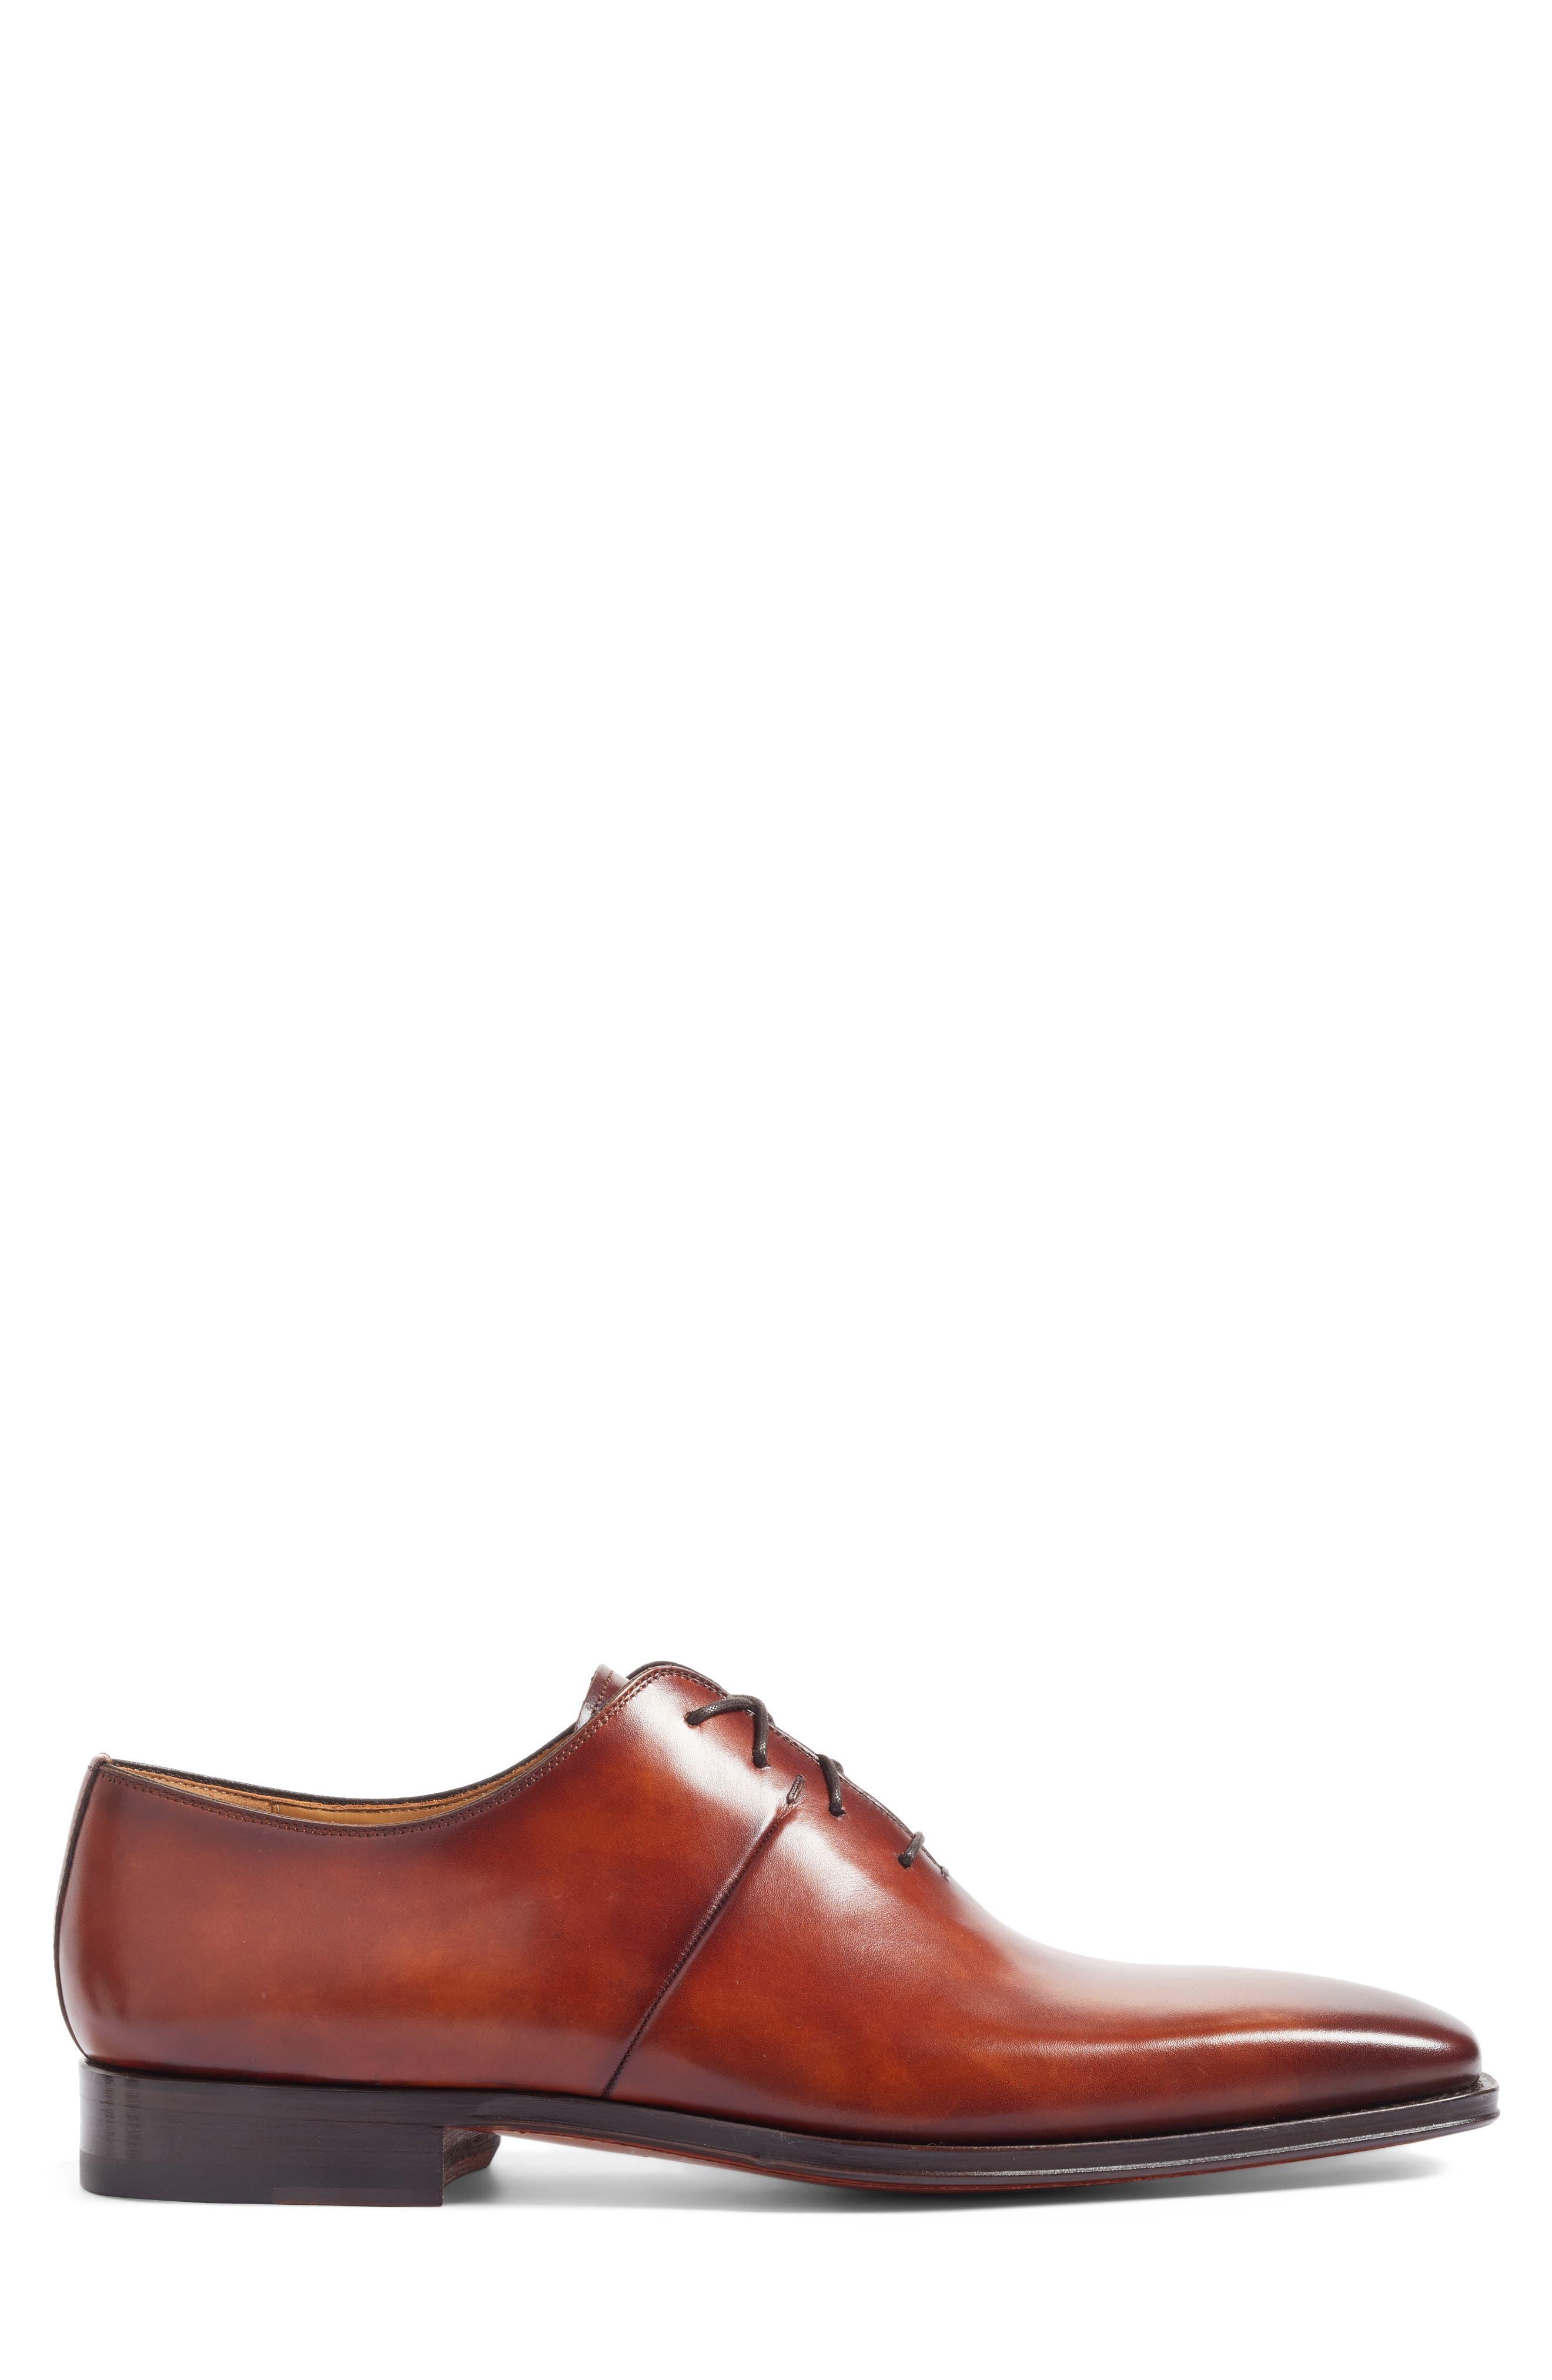 Cornado Plain Toe Oxford,                             Alternate thumbnail 3, color,                             200